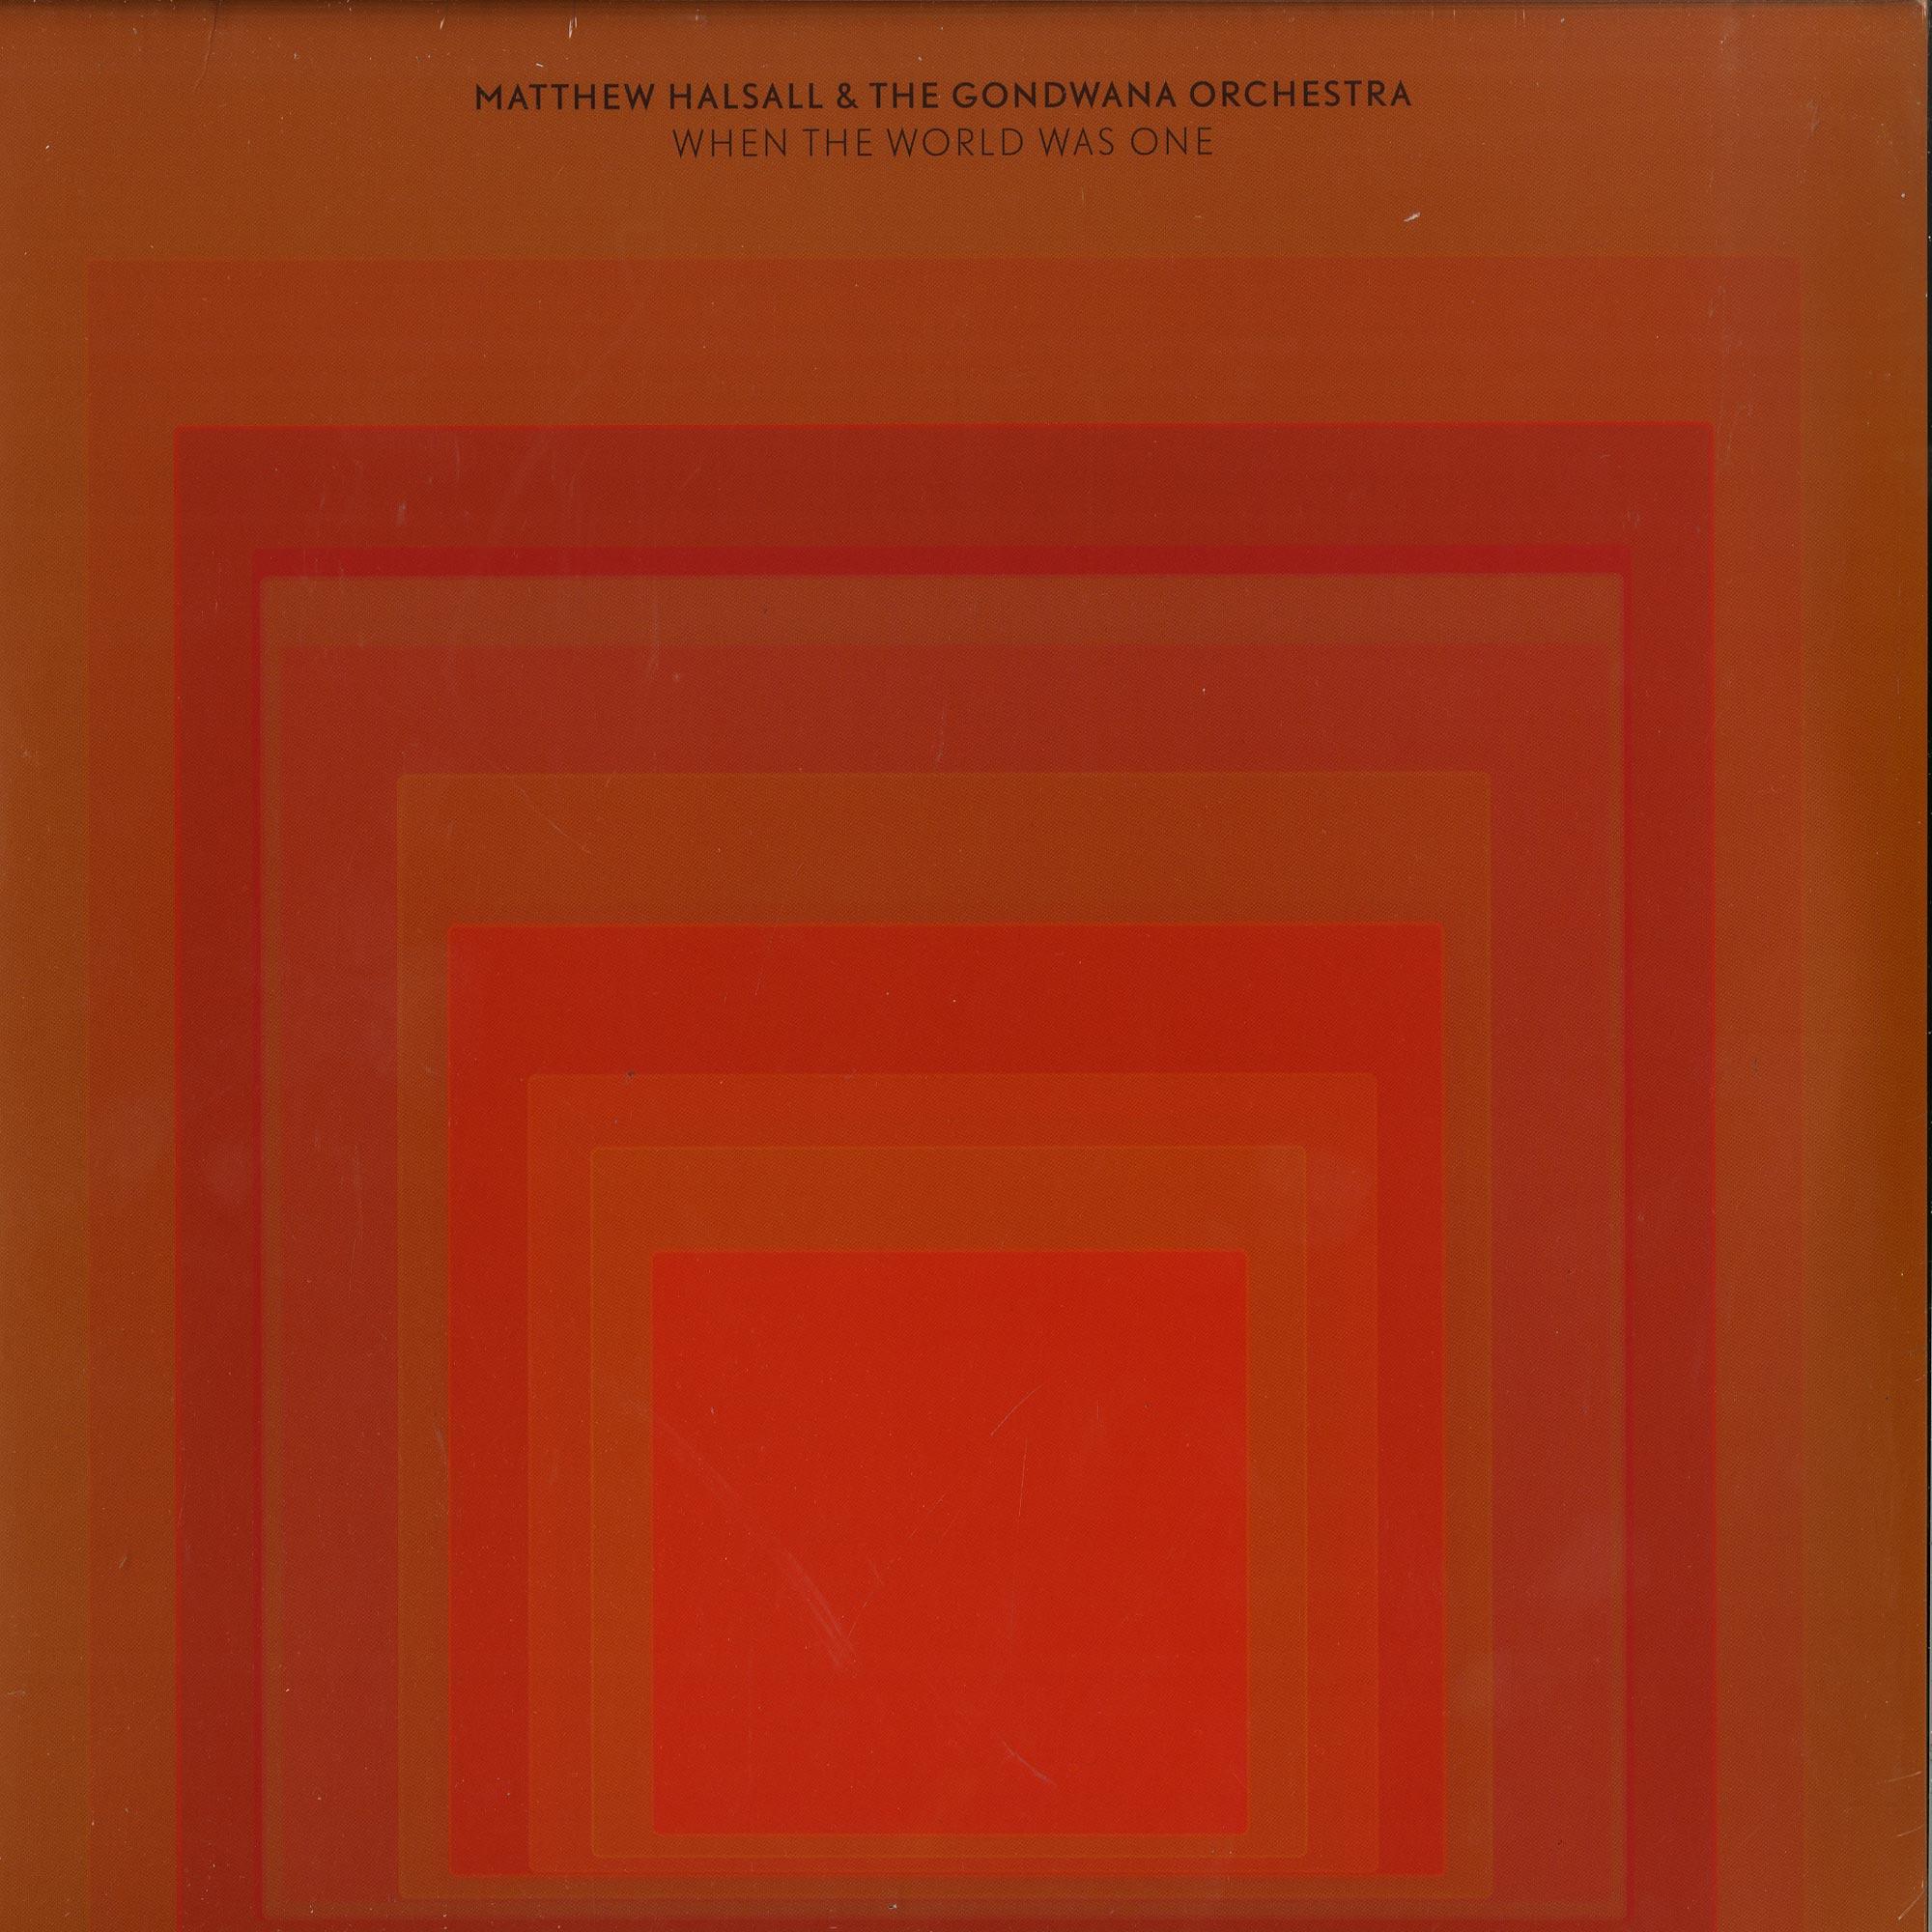 Matthew Halsall & The Gondwana Orchestra - WHEN THE WORLD WAS ONE